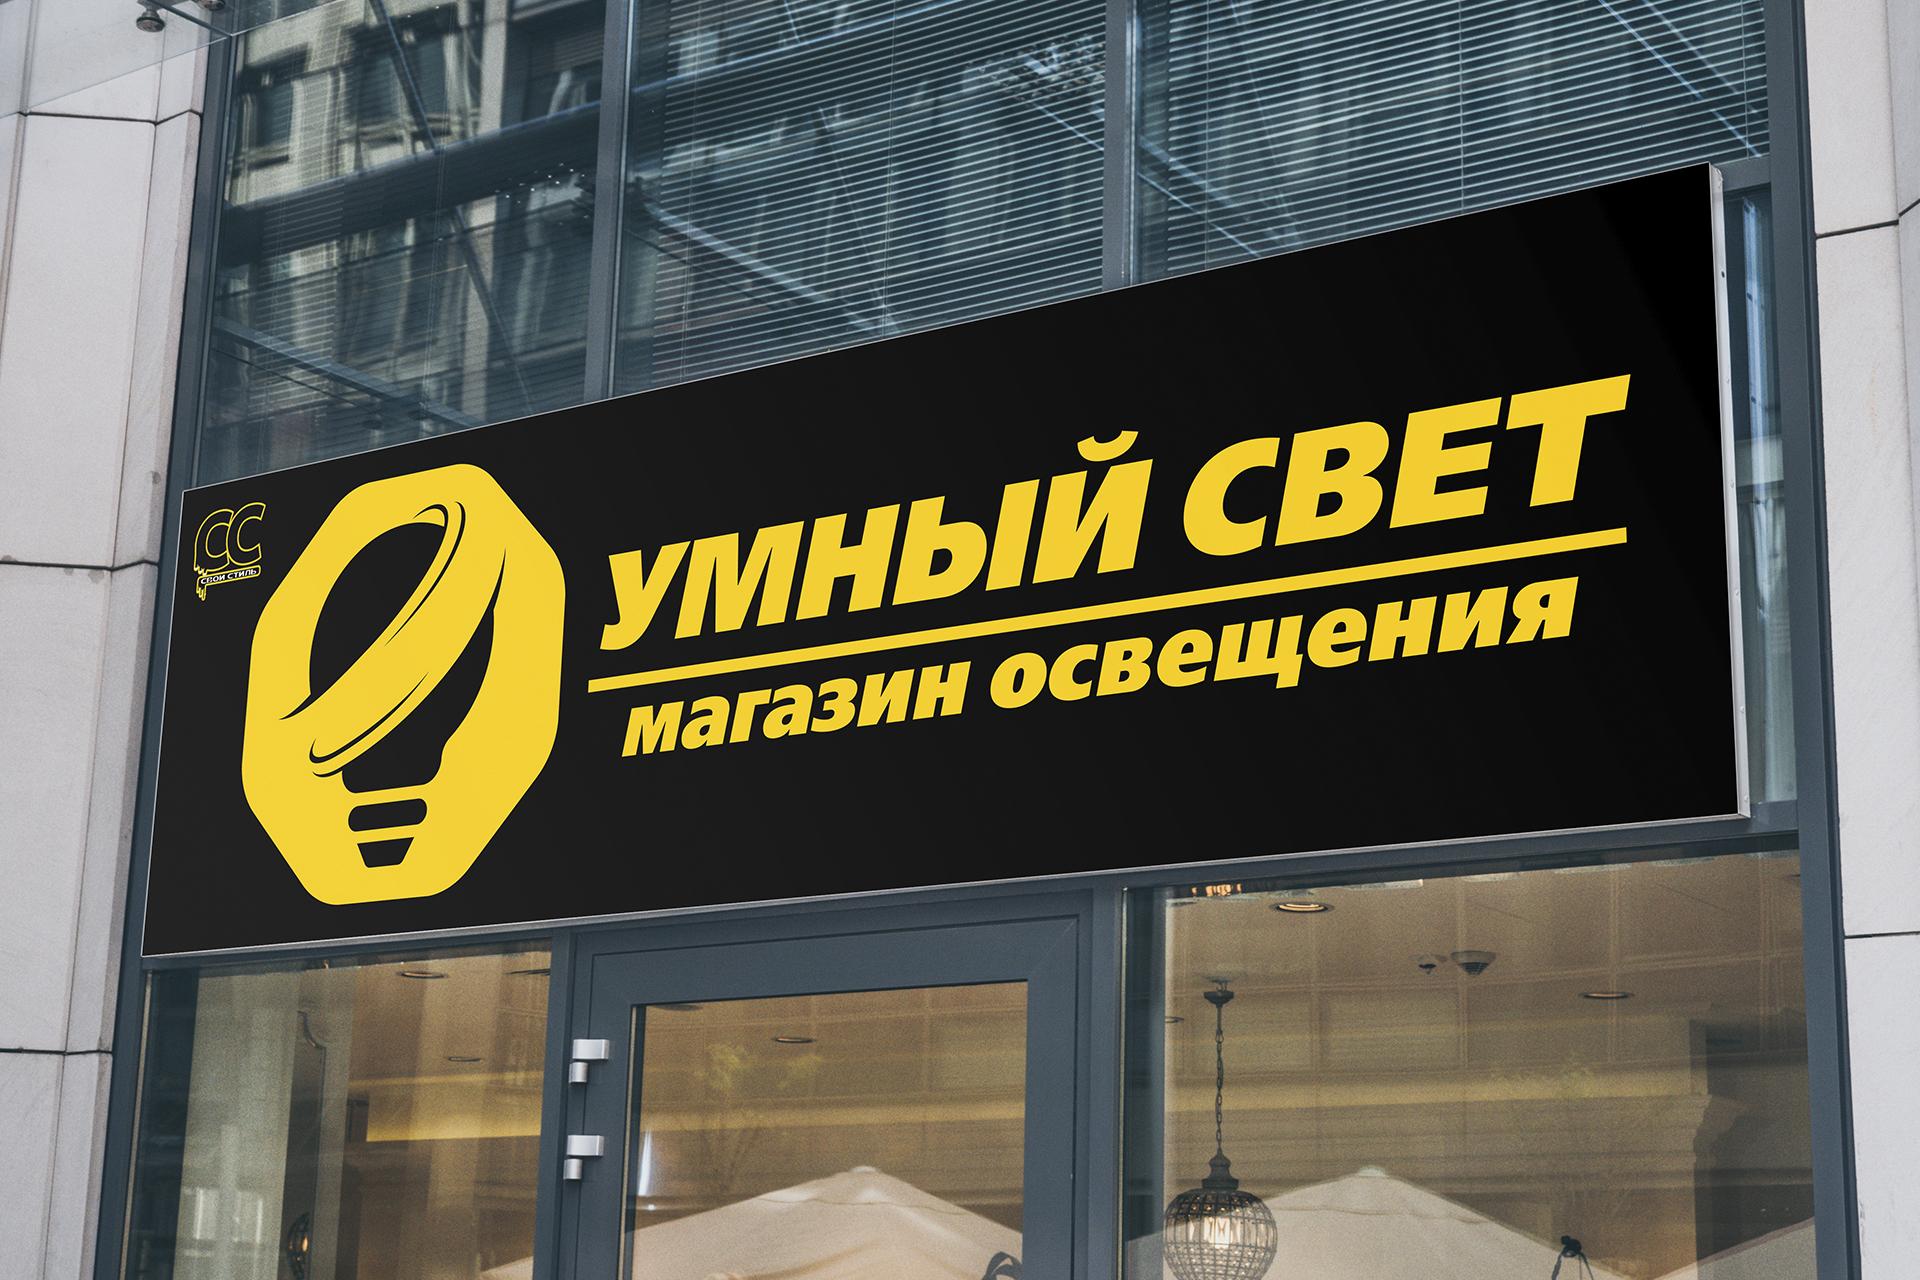 Логотип для салон-магазина освещения фото f_8835d0151765b9cb.jpg